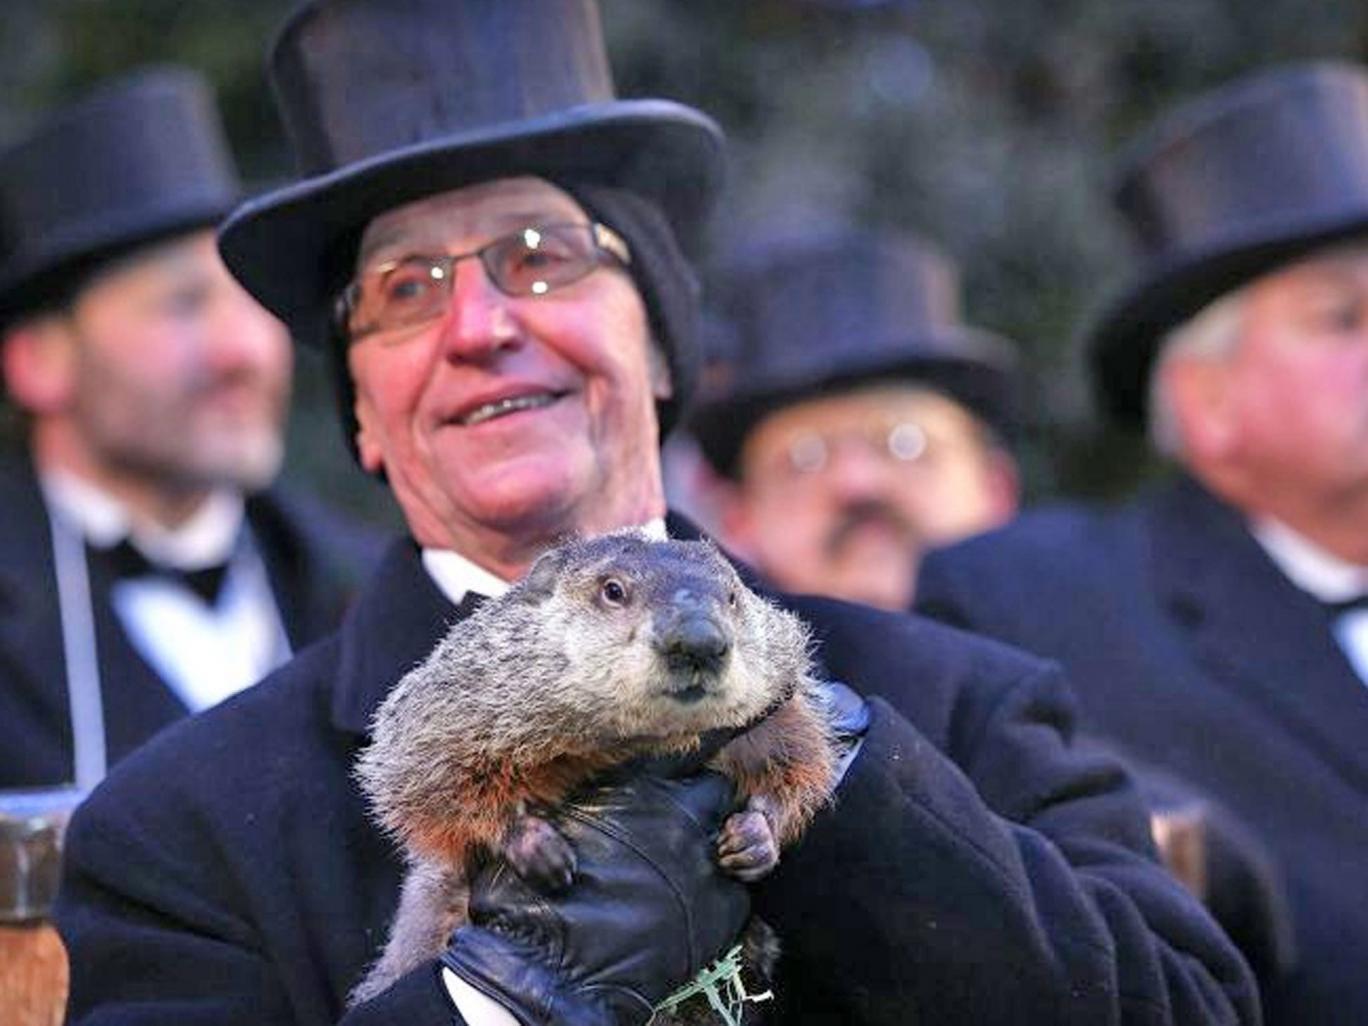 Co-handler Ron Ploucha holds Phil, the weather prognosticating groundhog during the Groundhog Day celebration at Gobblers Knob in Punxsutawney, Pennsylvania, USA